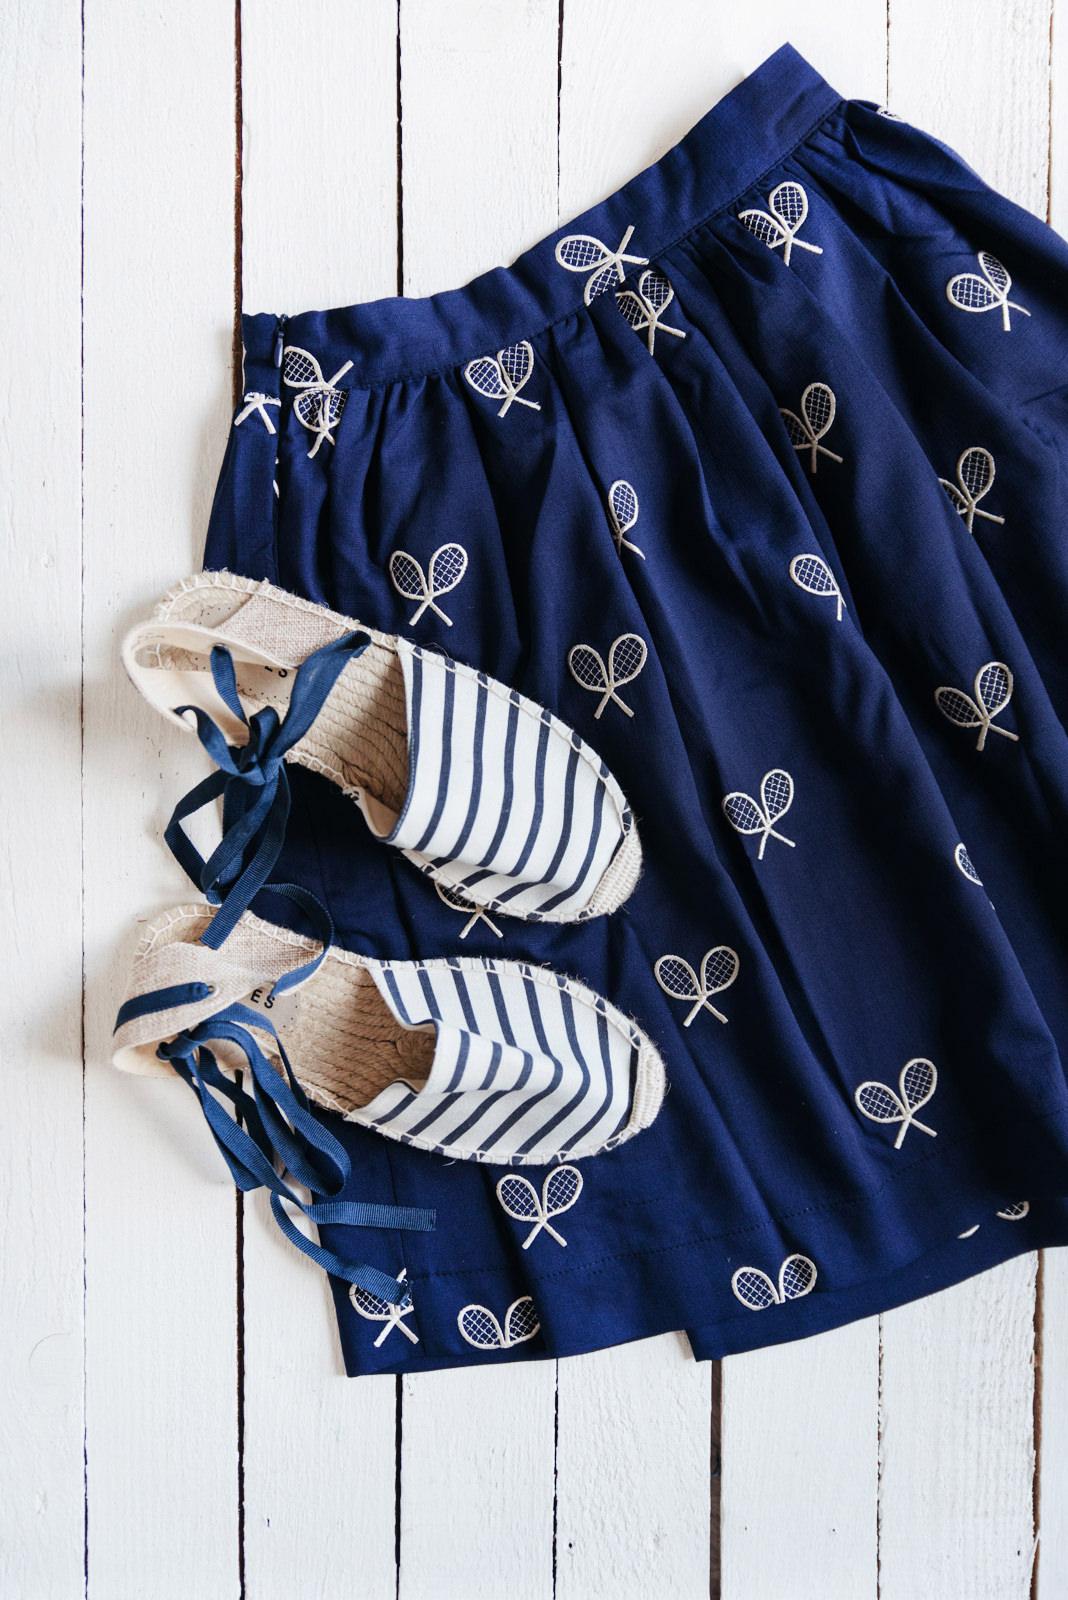 Blog-Mode-And-The-City-Lifestyle-Cinq-Petites-Choses-216-jupe-raquettes-pepaloves01